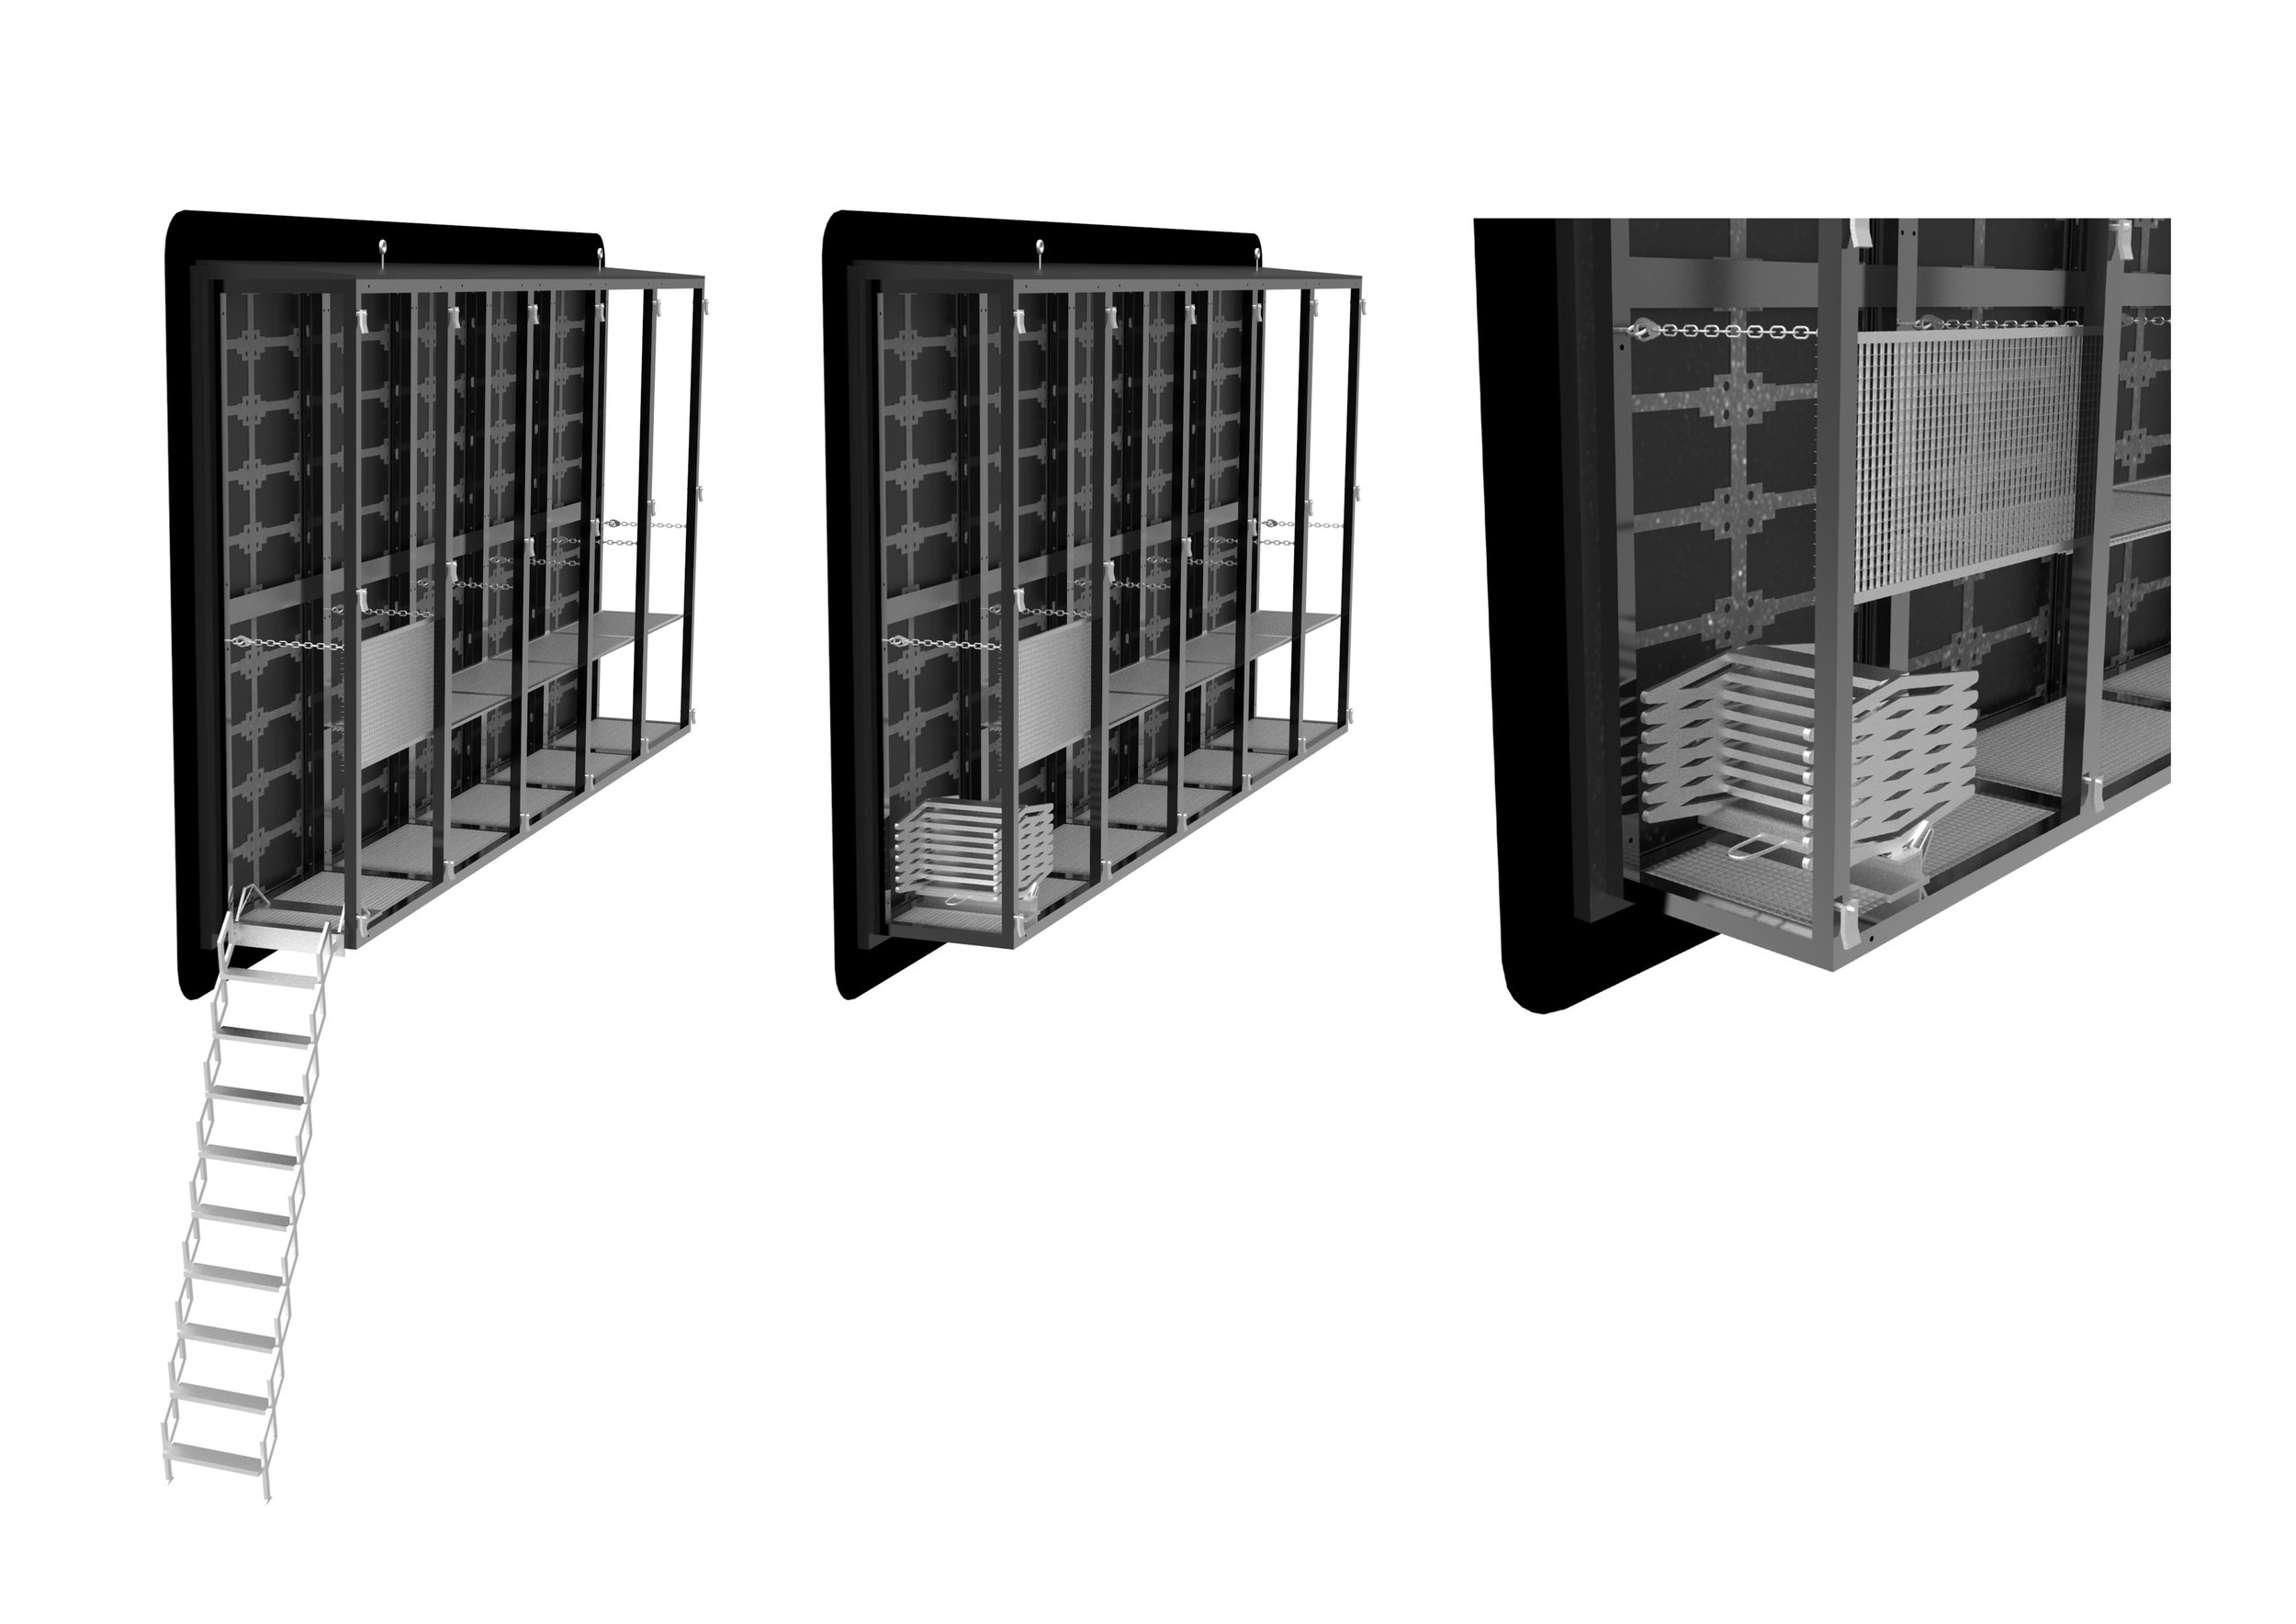 D48 Frame - Ben Dresner-Reynolds 9.11.18.jpg